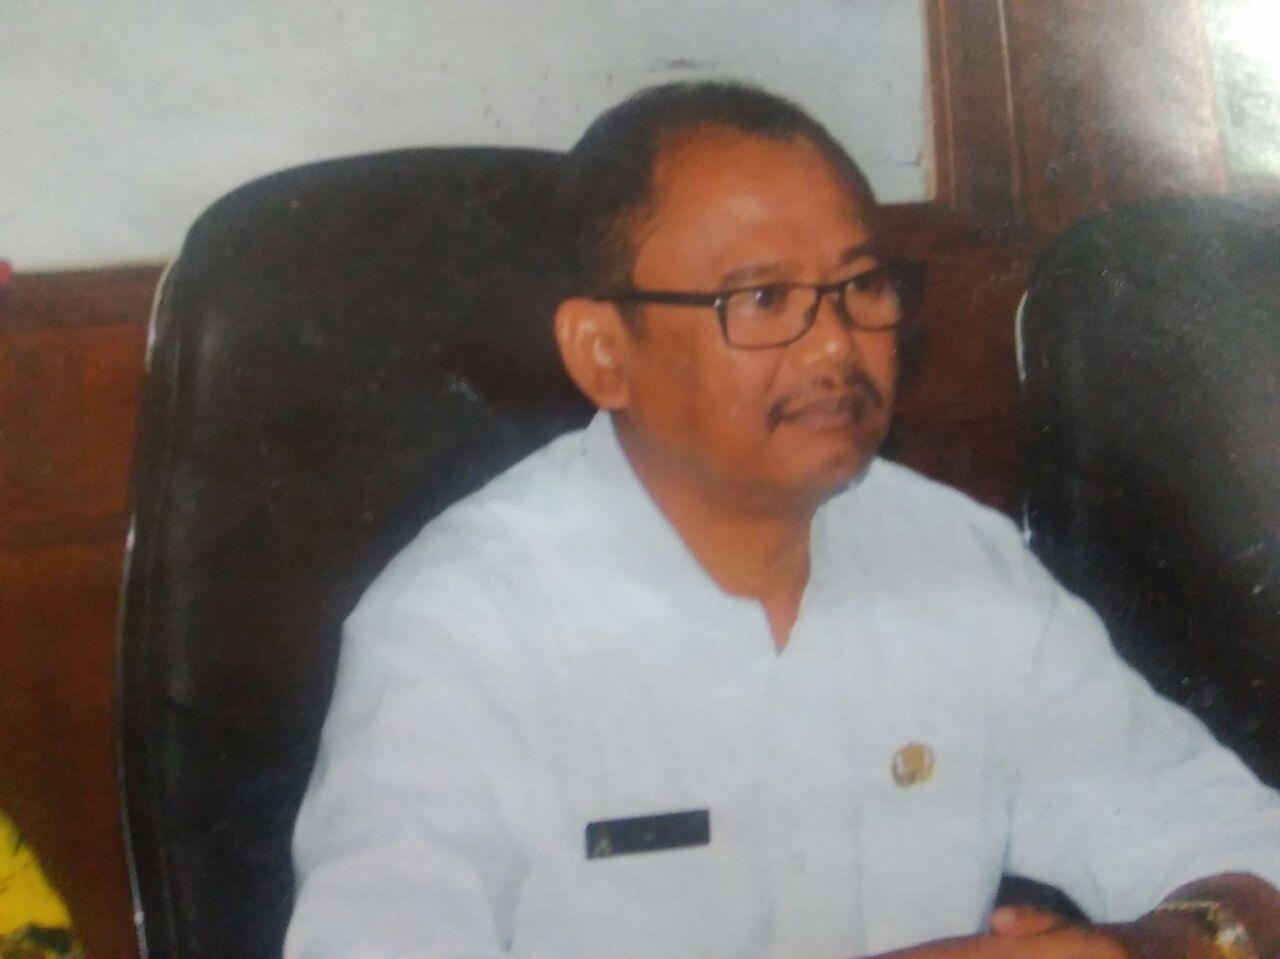 Uang Makan Potong,Pegawai Dinas Kelautan Dan Perikanan Mengeluh